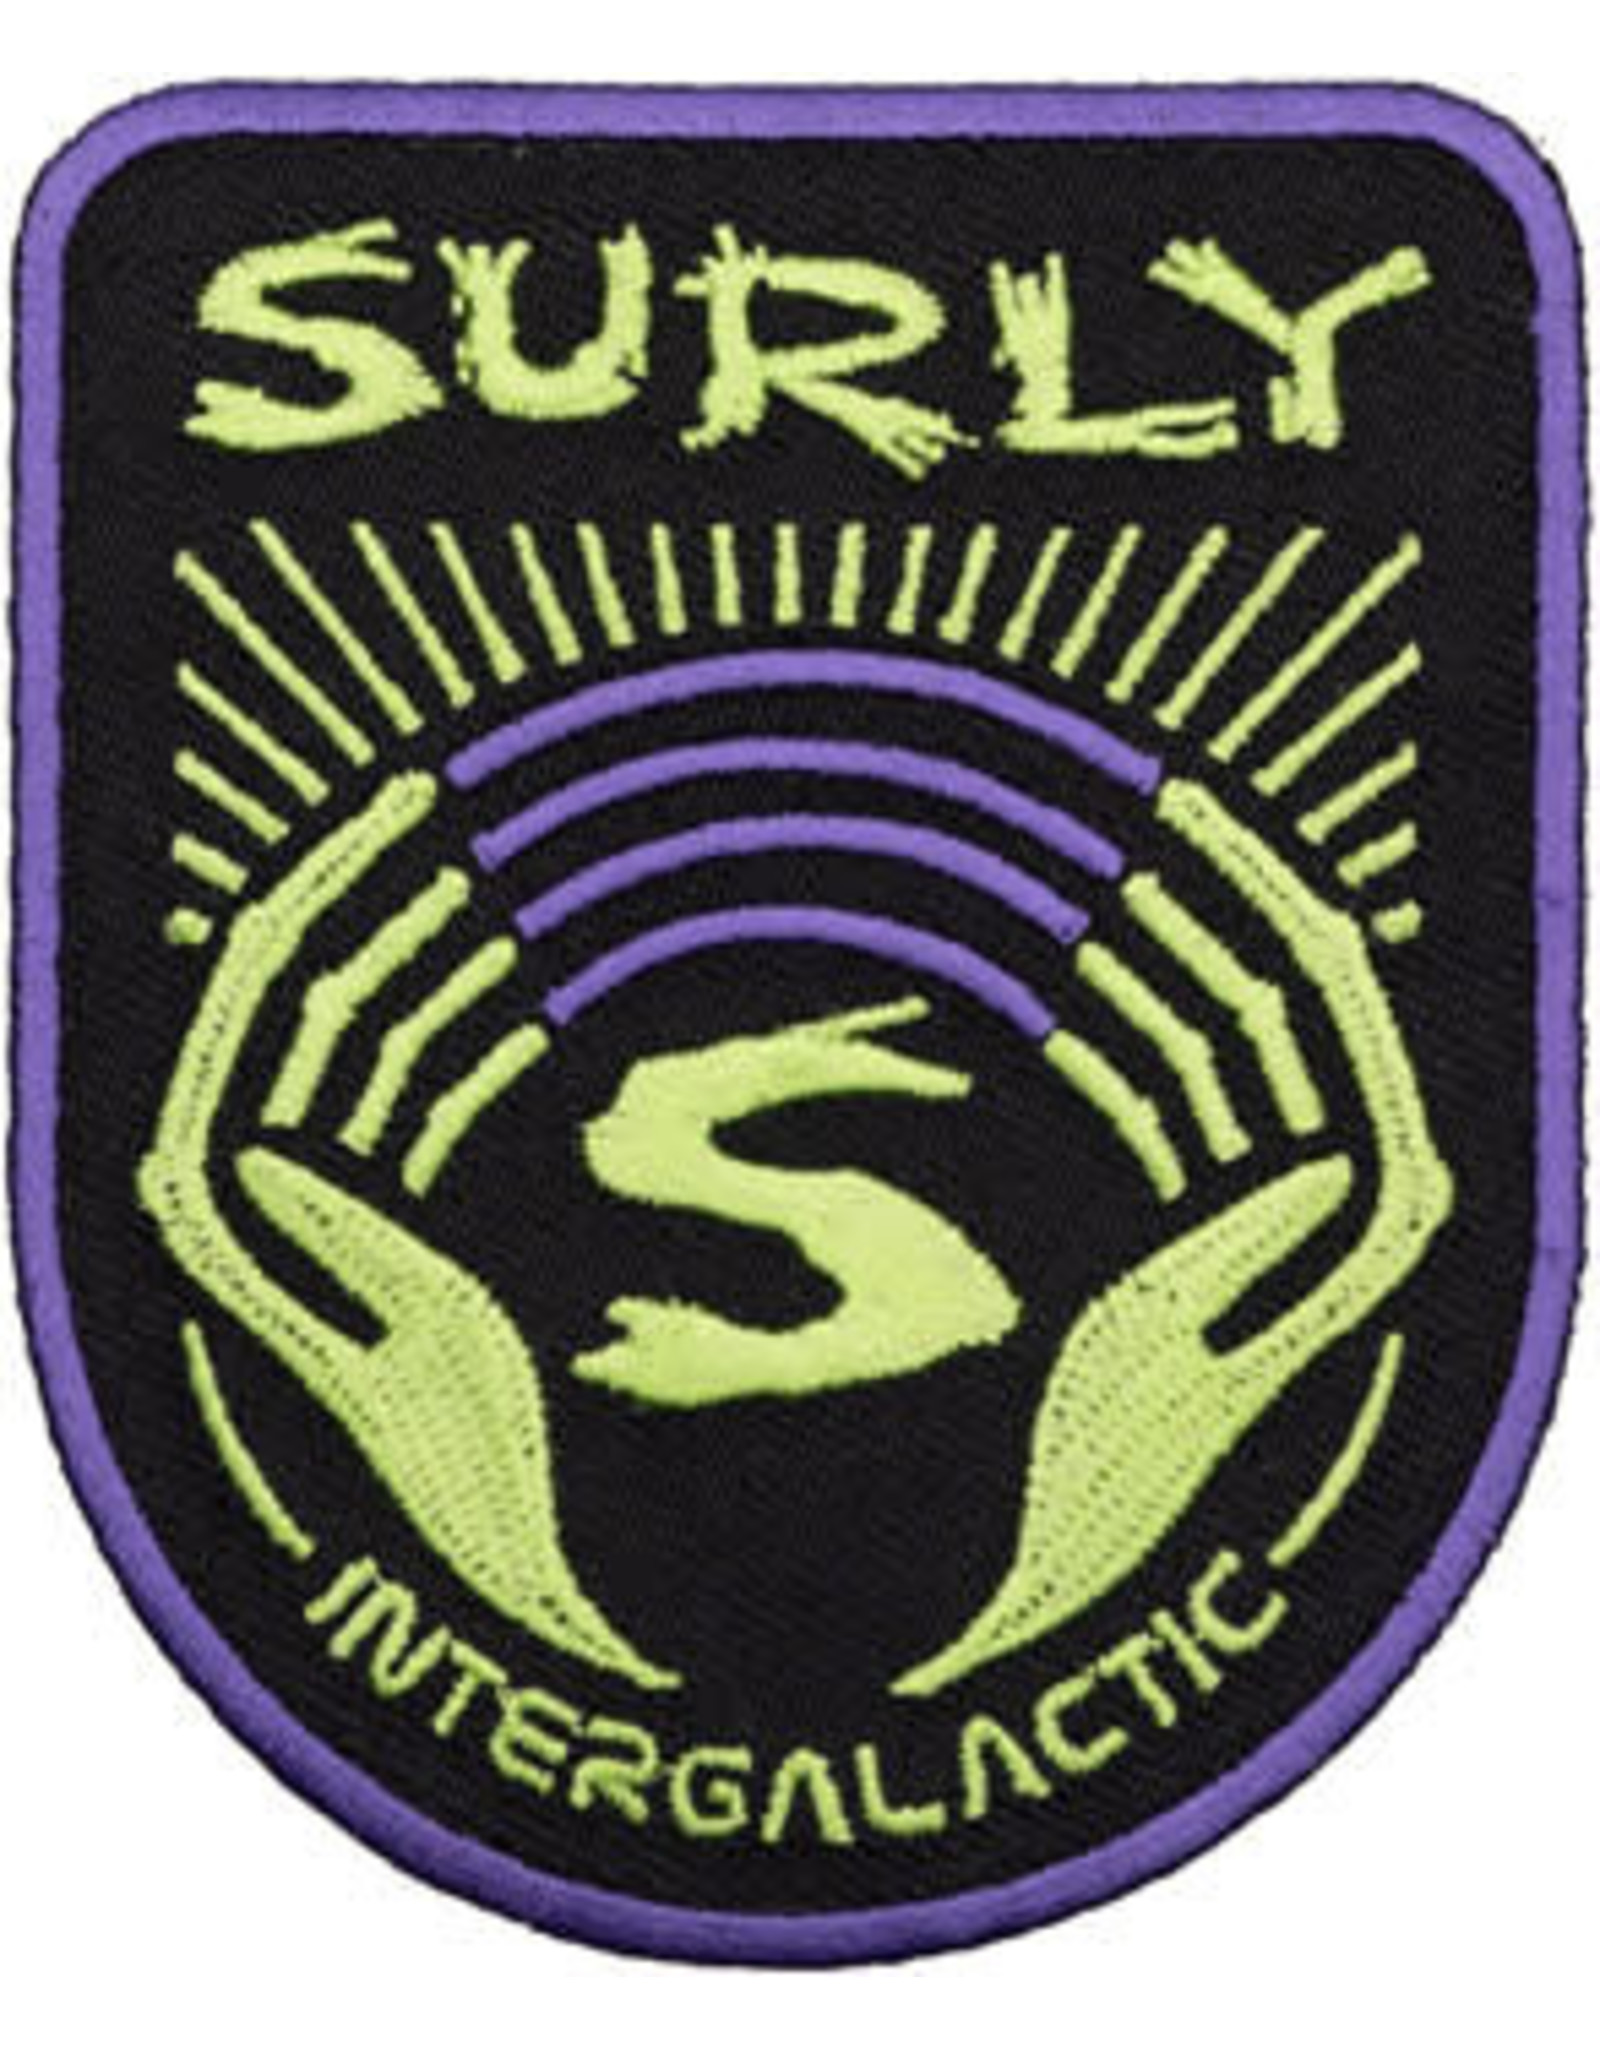 Surly Surly Intergalactic Patch: Black/Purple/Green